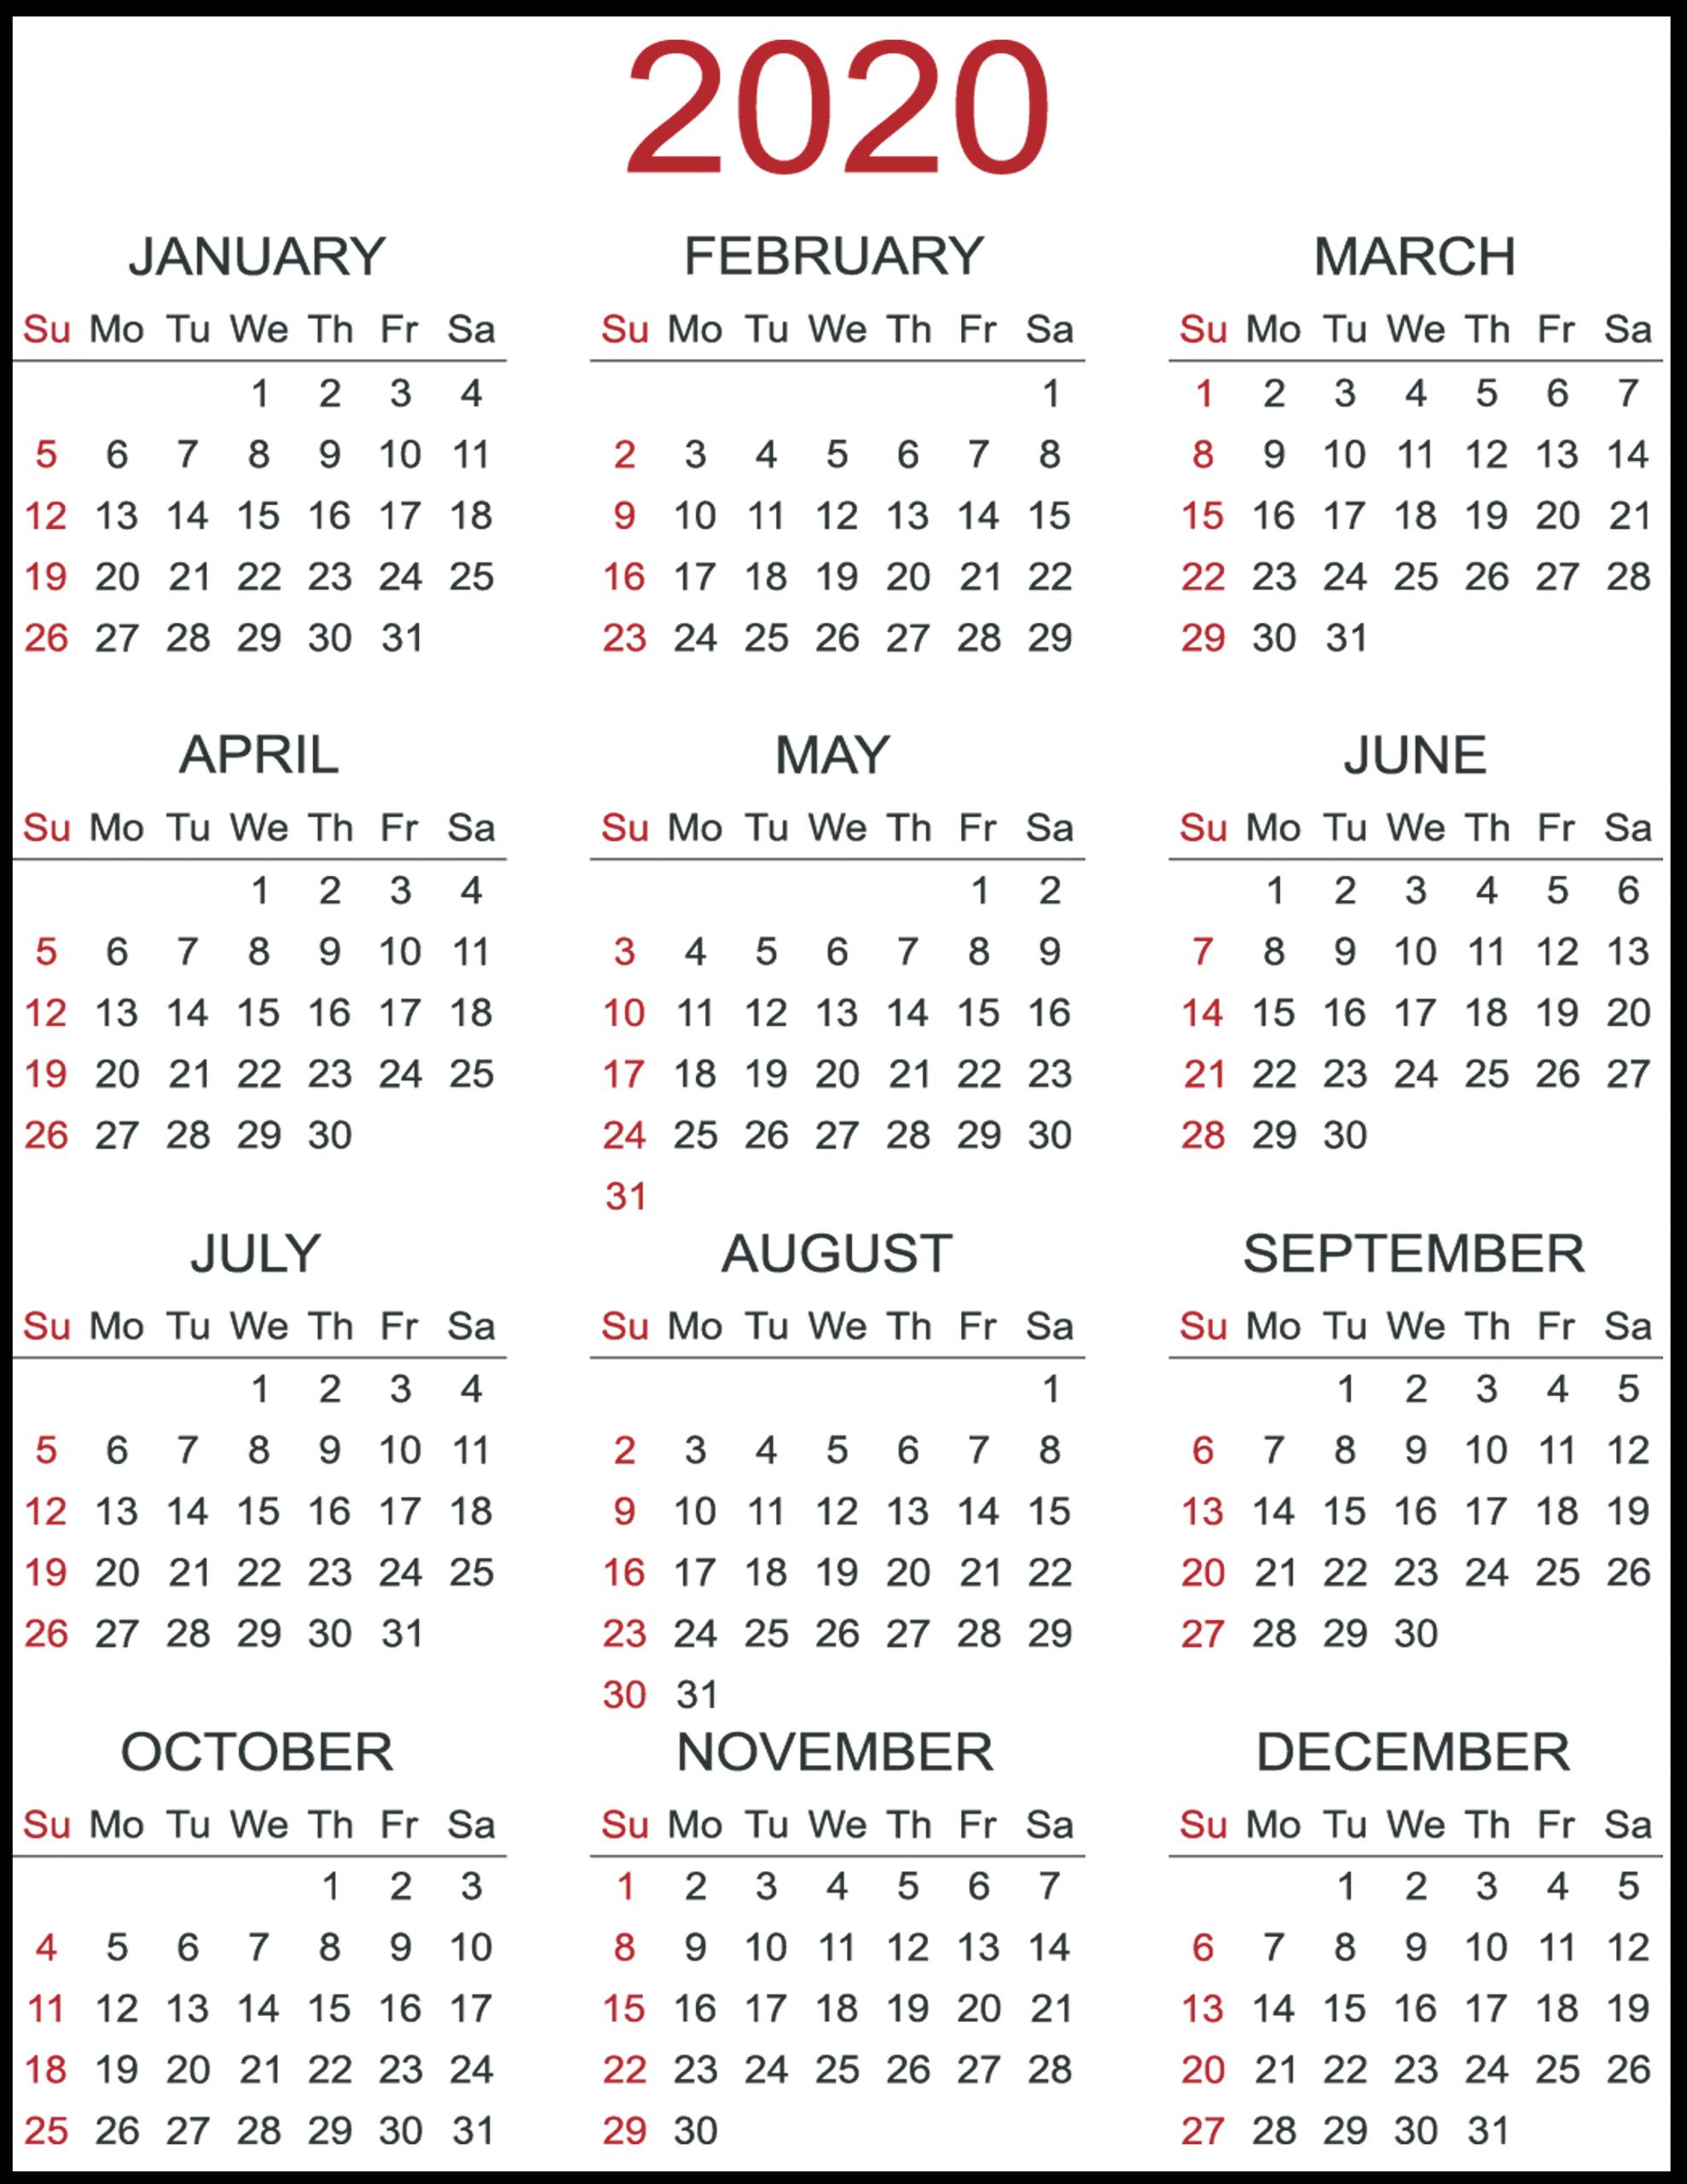 Free 2020 Calendar Template - Togo.wpart.co